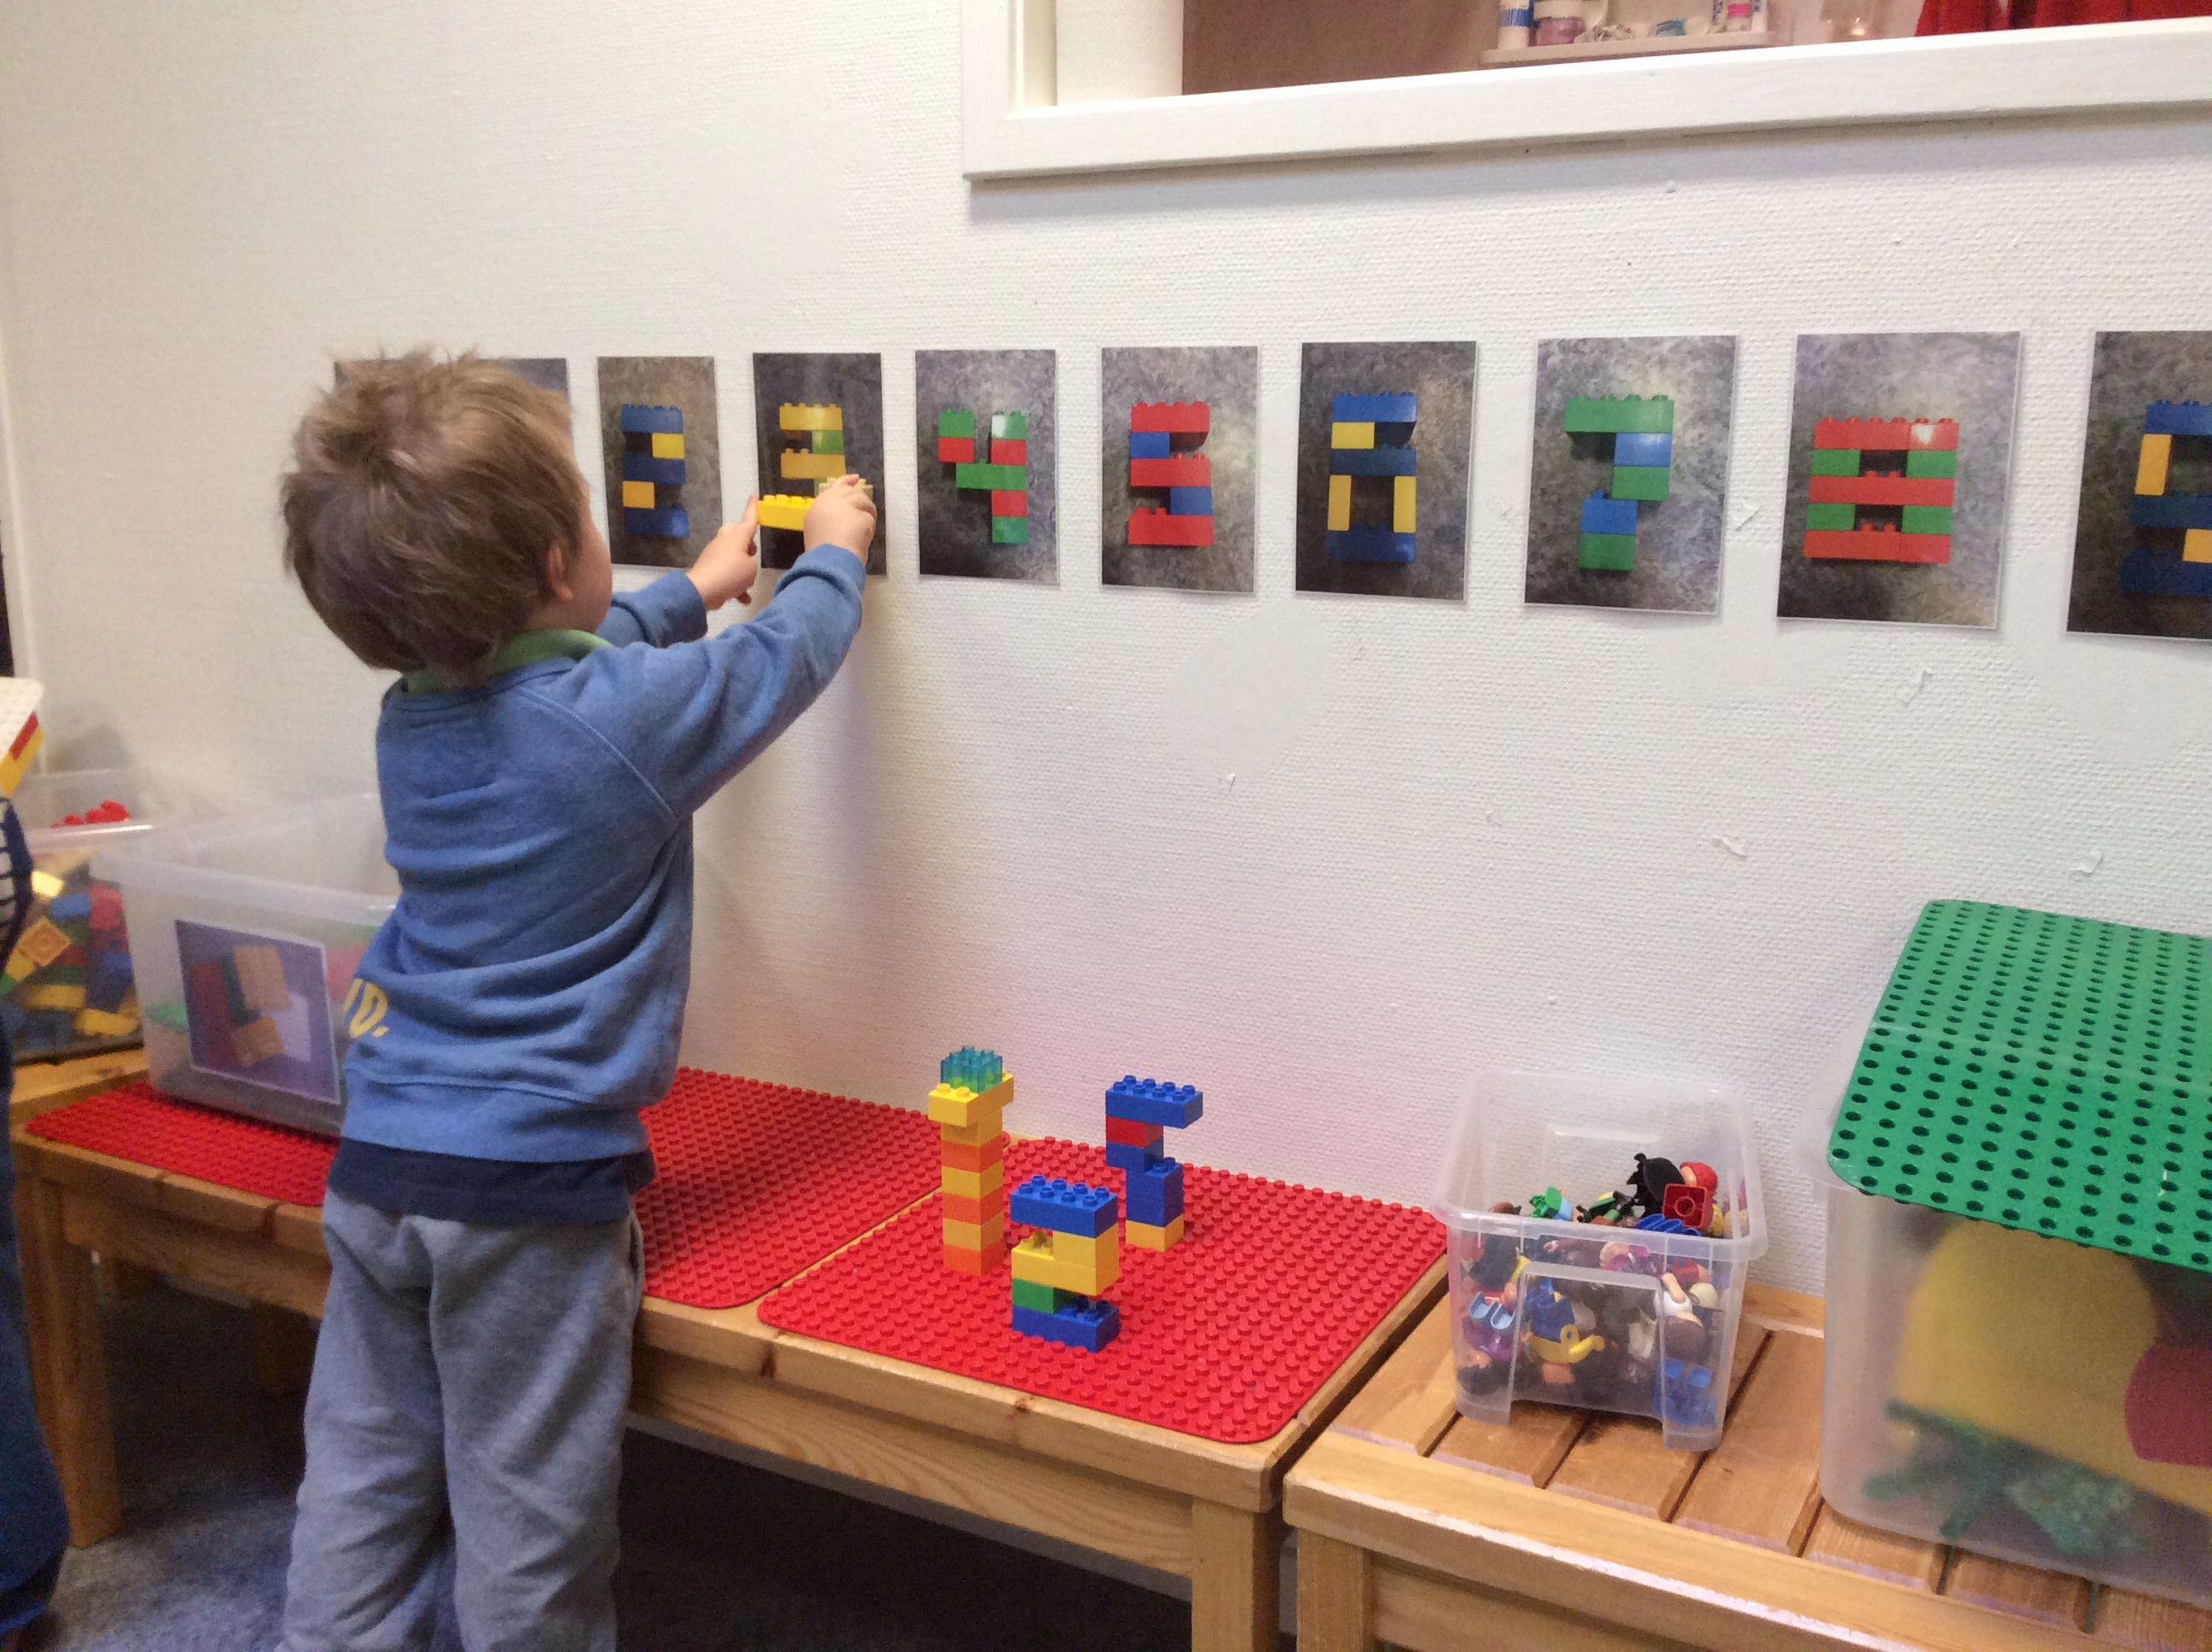 Playing with legonumbers lernspiele pinterest mathe for Raumgestaltung lernwerkstatt